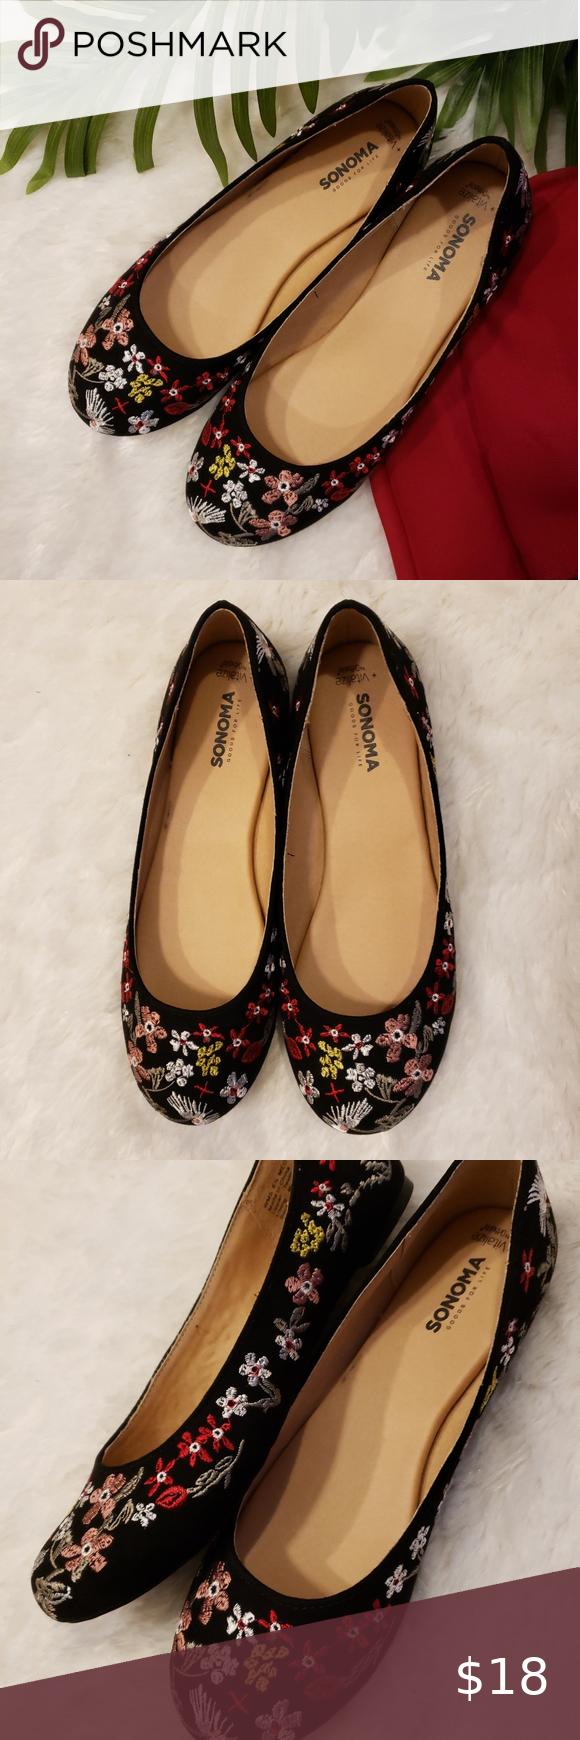 Sonoma shoes, Womens ballet flats, Flat